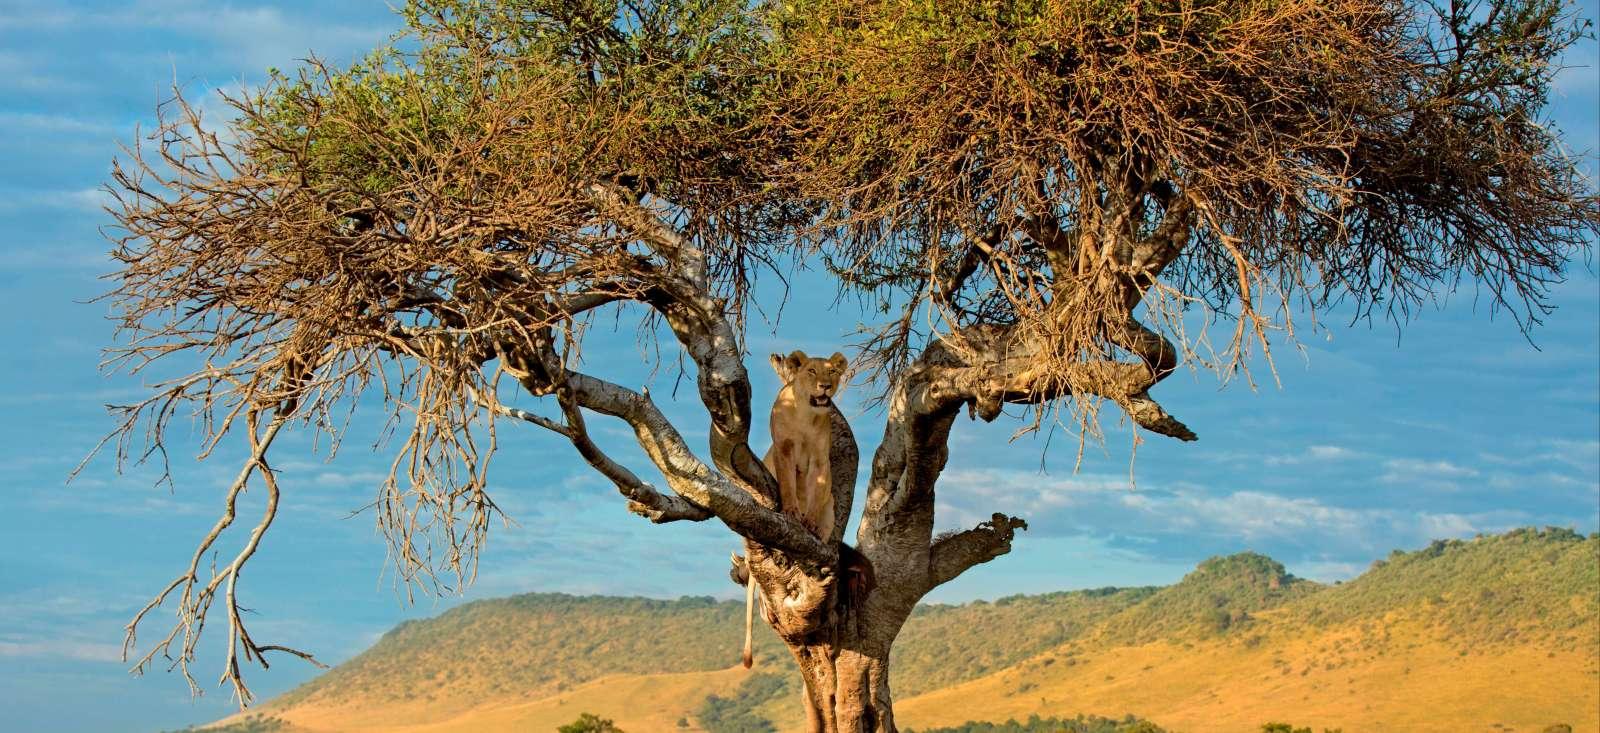 Voyage avec des animaux : Safari & Rando en pays Masaï